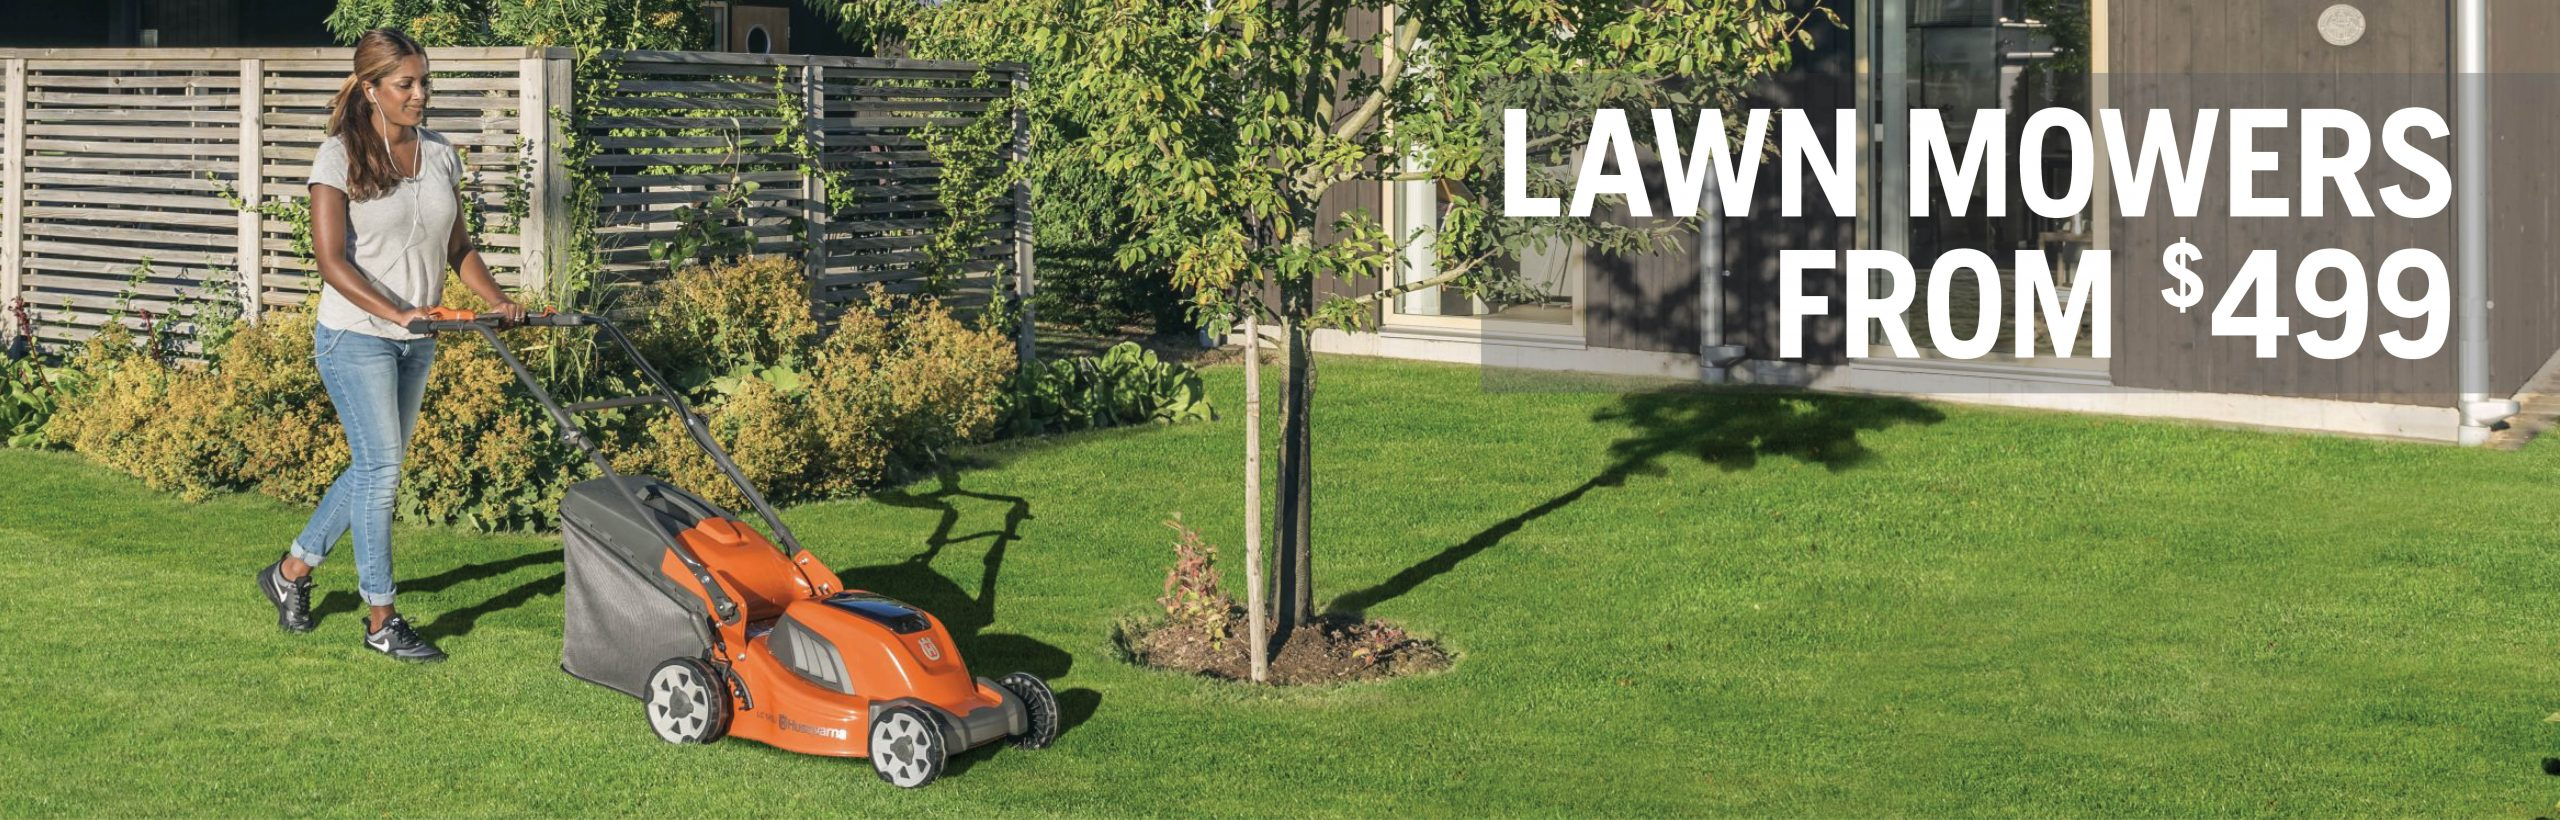 Spring 2020 - Lawn mowers